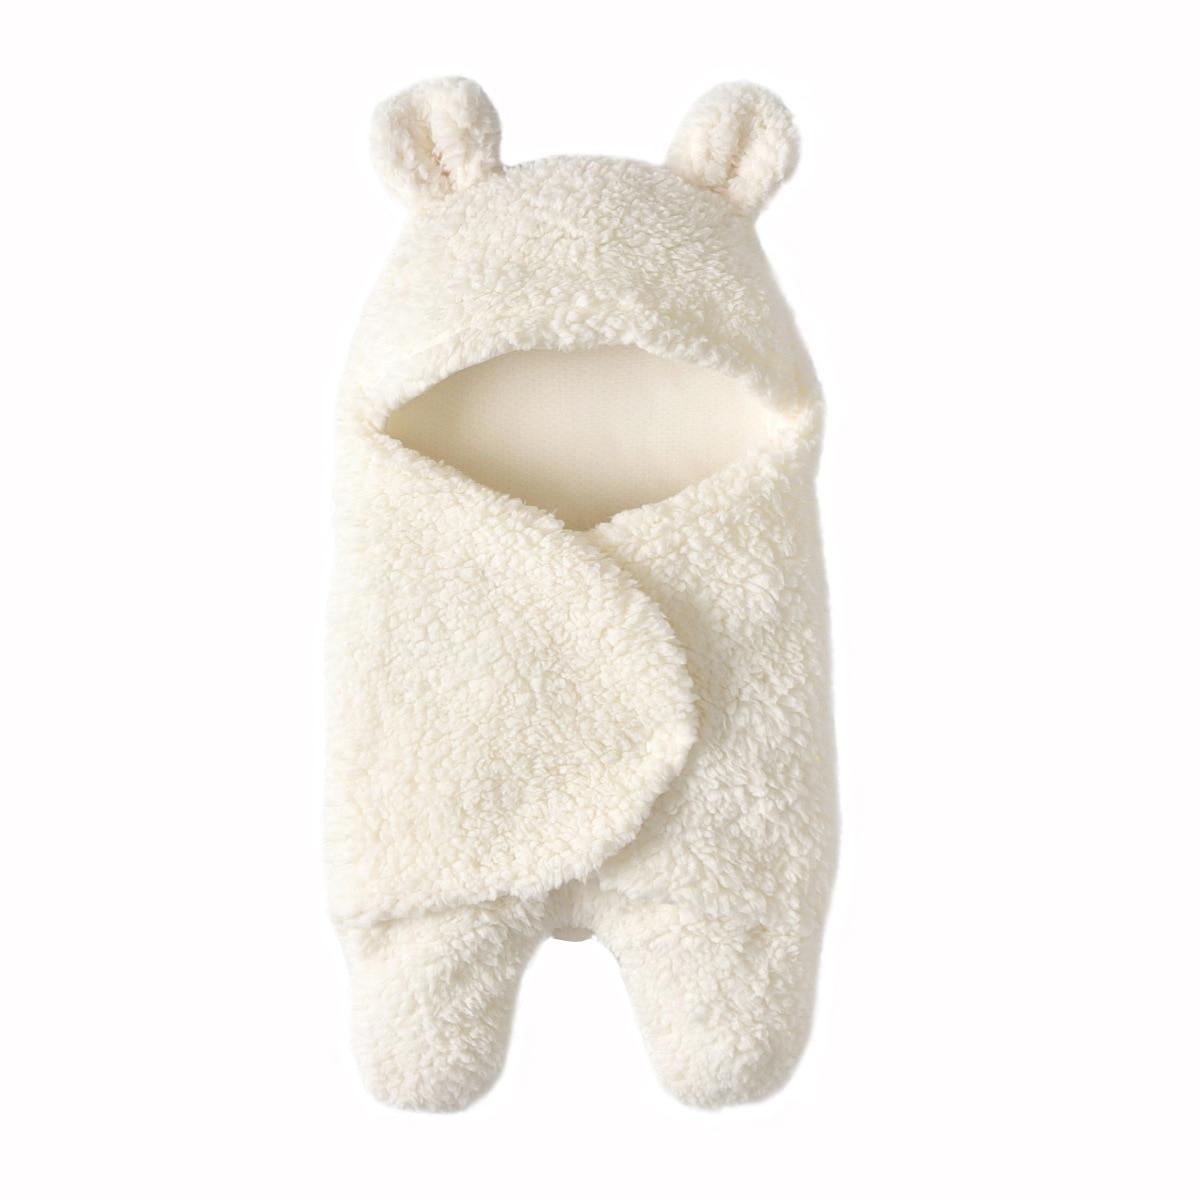 Baby Bedding Adroit Newborn Baby Sleeping Bag Sub-leg Type Girl Baby Spring Baby Boy Sleeping Bag Fall Blanket & Swaddling Winter Clothes Elegant In Style